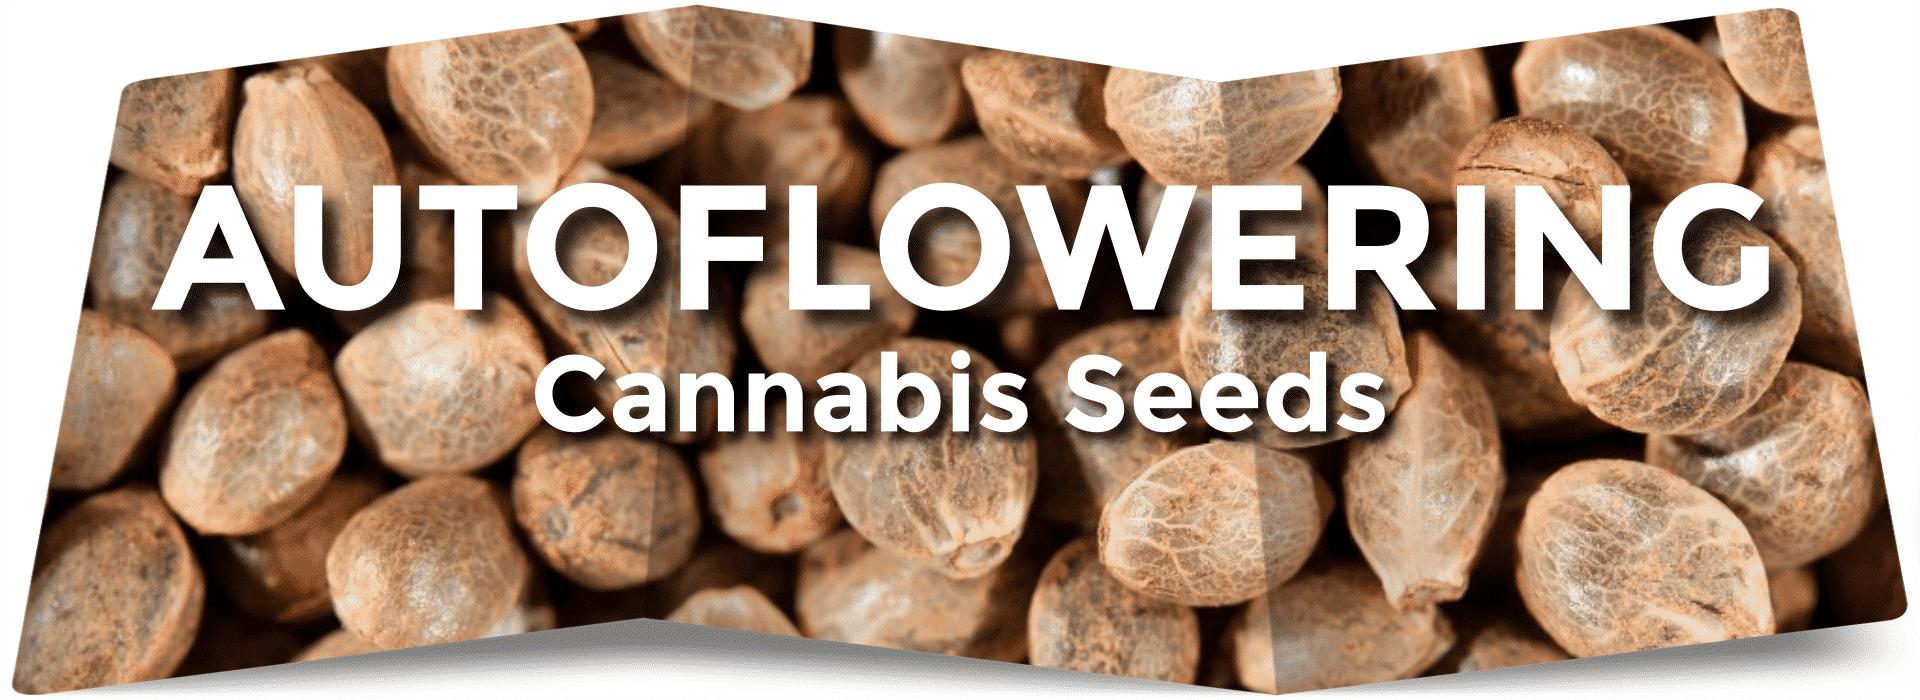 Autoflower Cannabis Seeds - Greenpoint Seeds